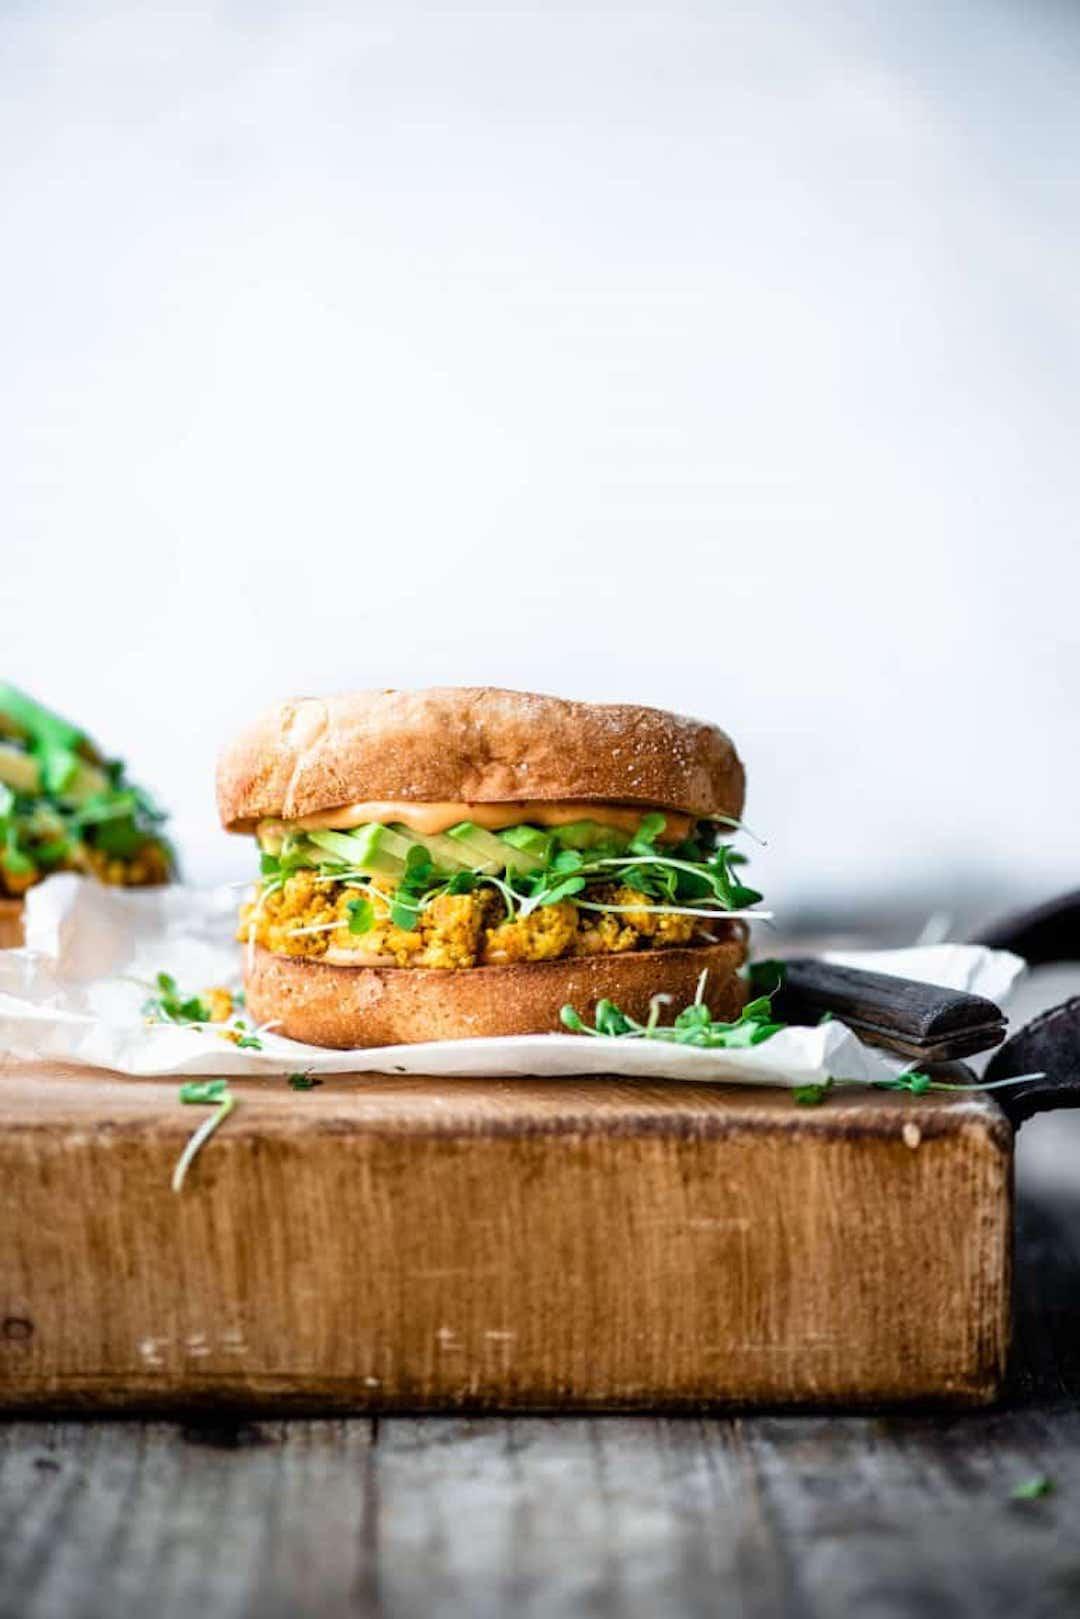 11 Yummy Plant Based Sandwiches - Gluten Free Breakfast Sandwich from Crowded Kitchen